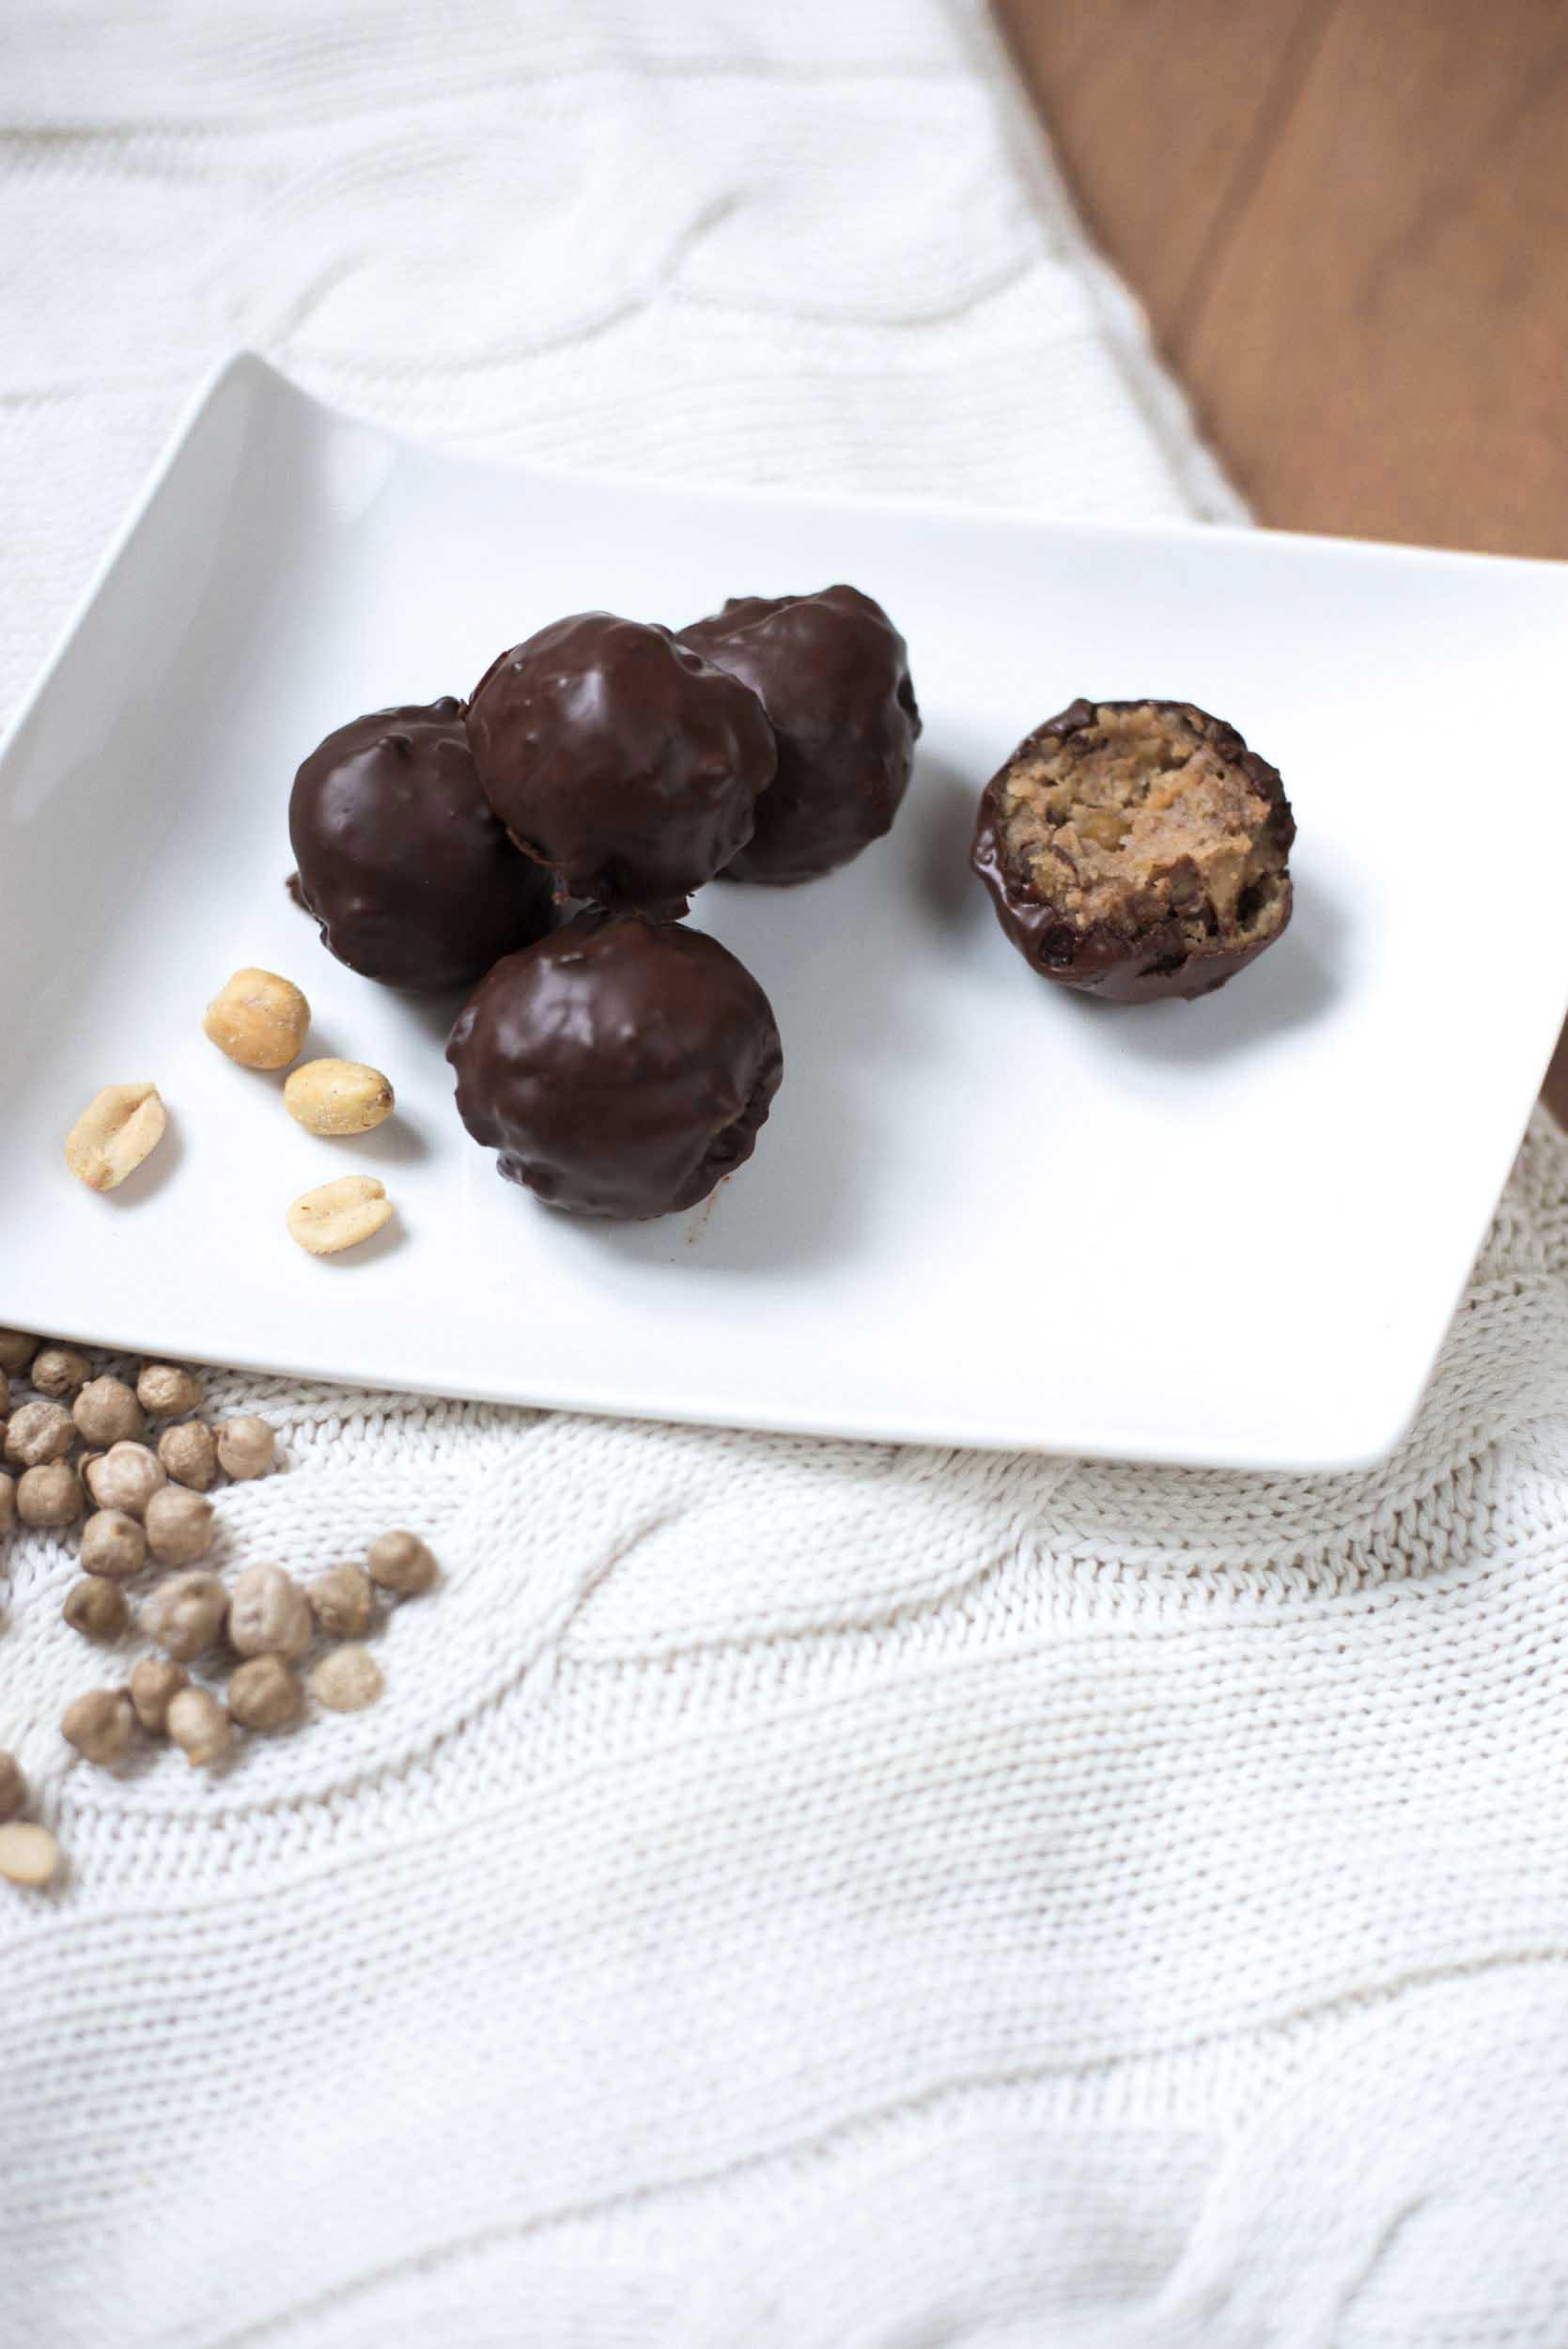 vegan peanut butter cookie dough balls gluten-free chocolate chickpeas peanuts